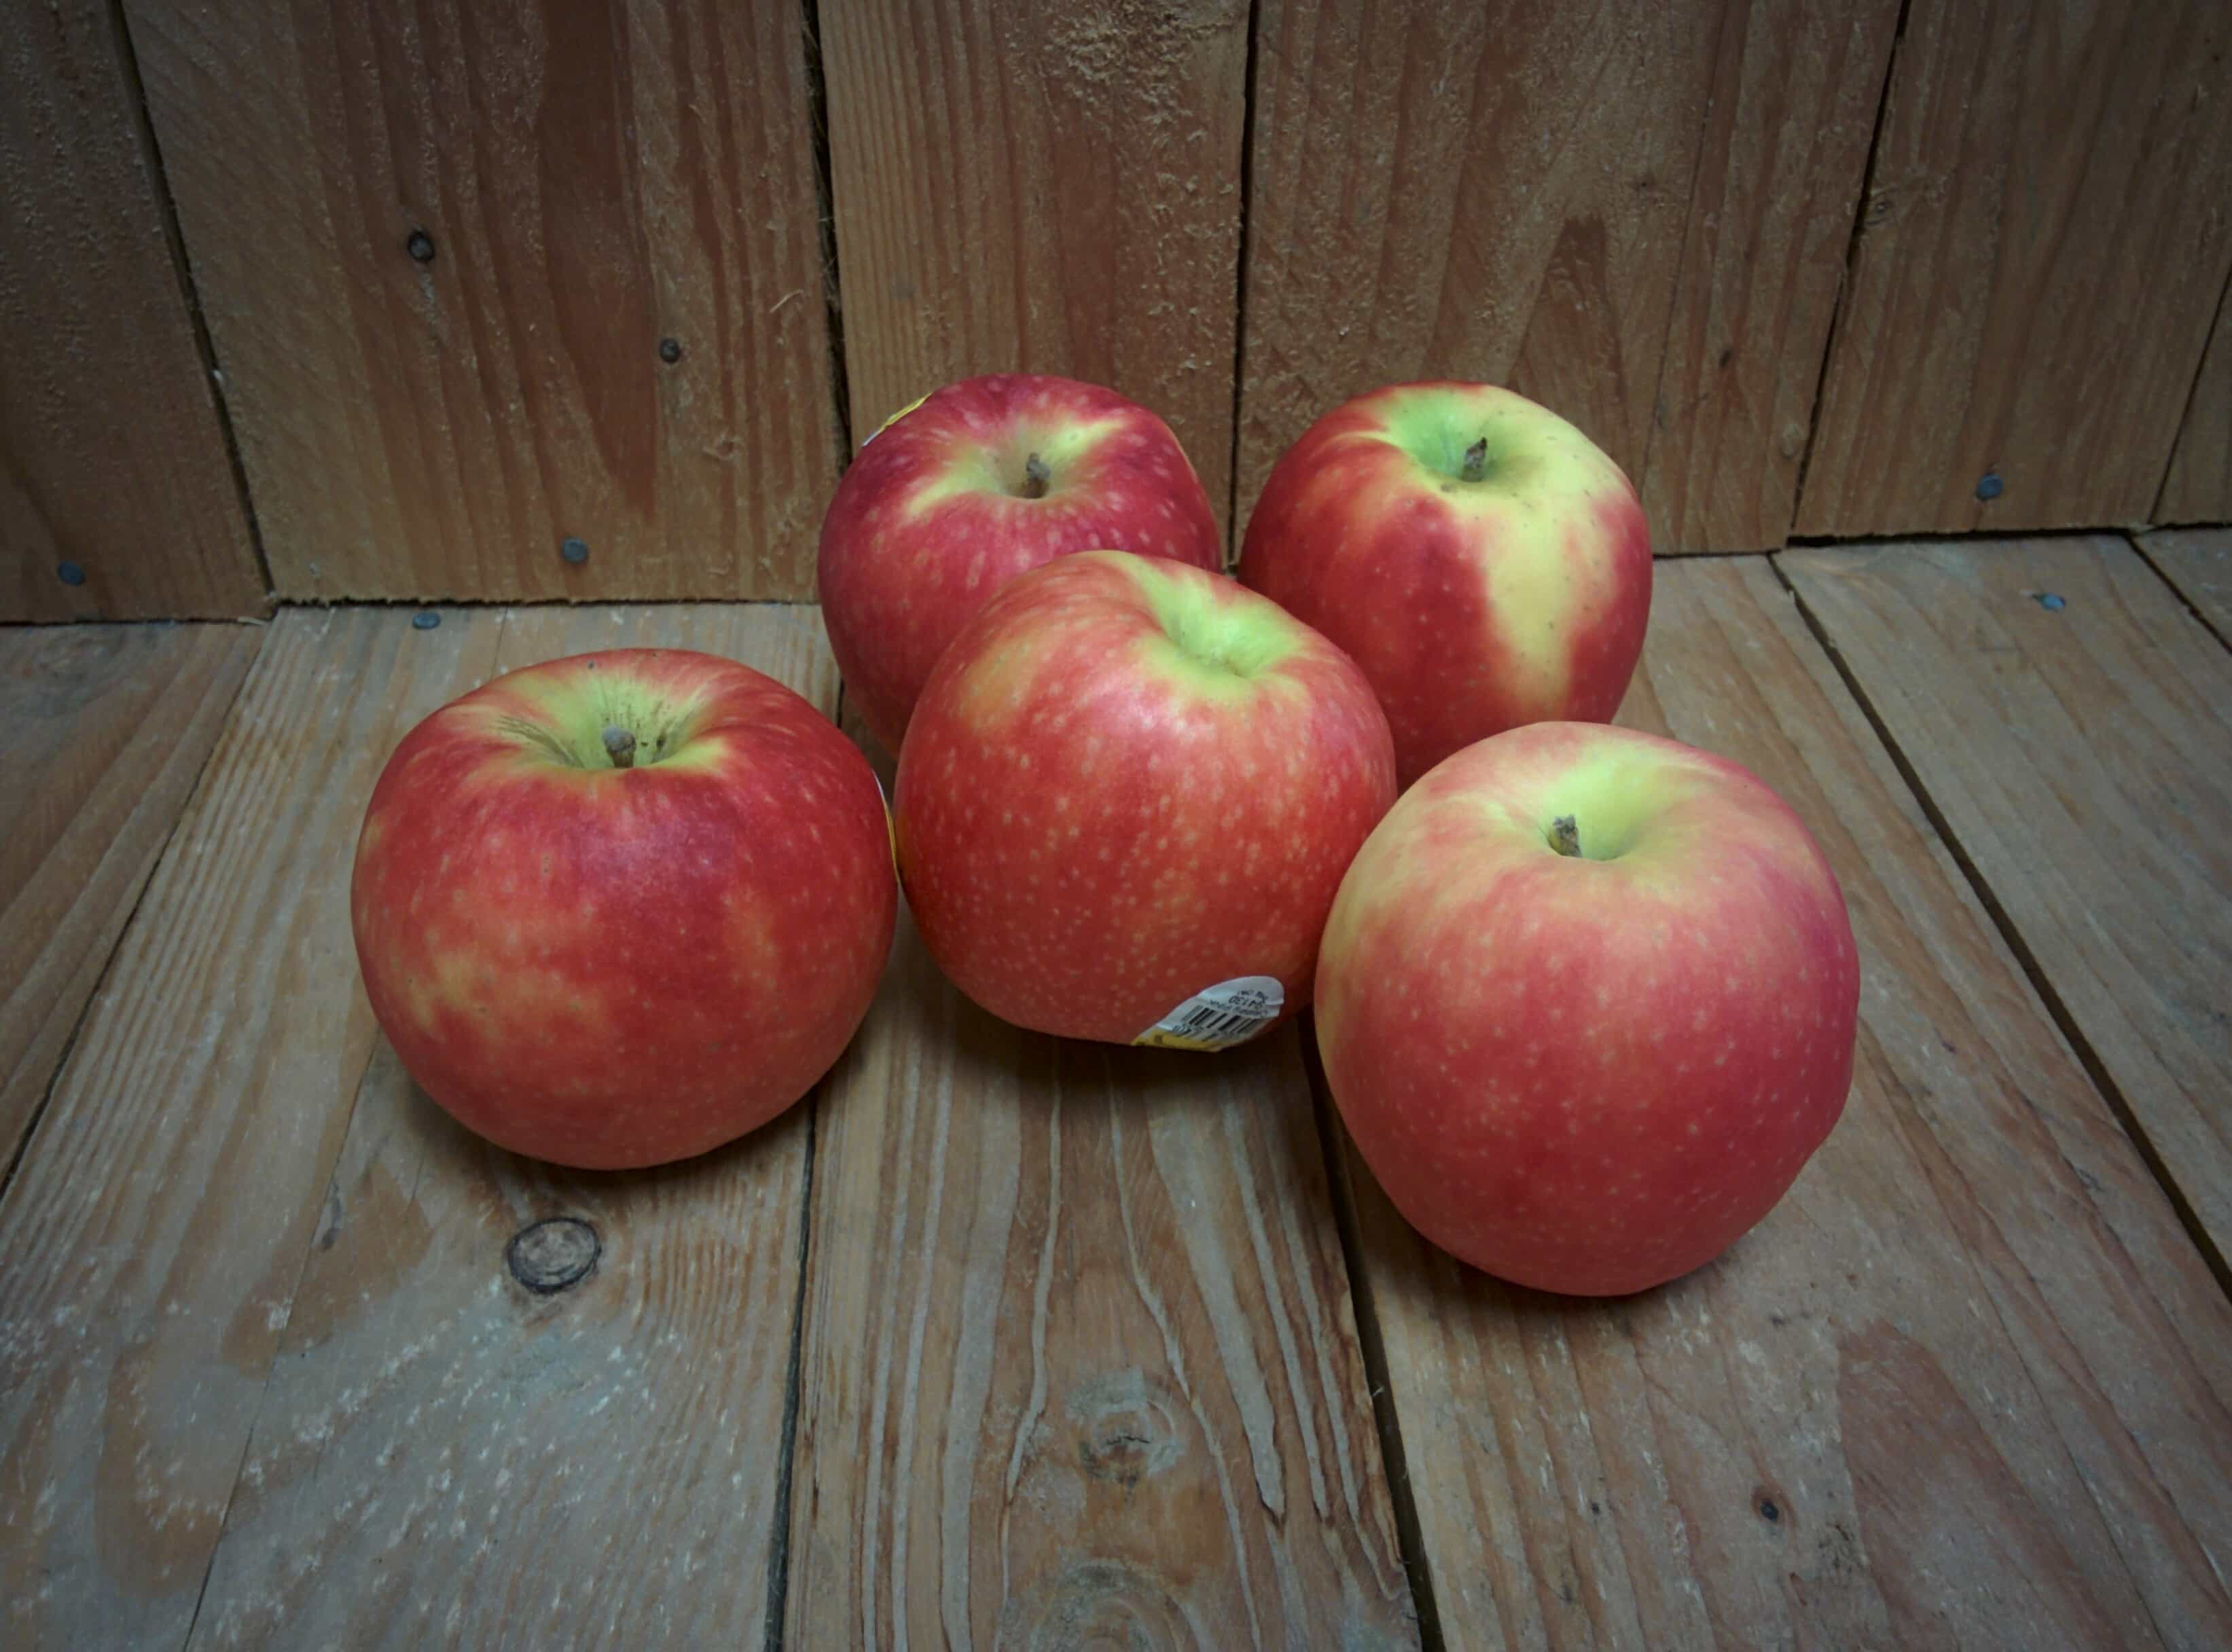 Apples – Pink Lady (Bag of 5)